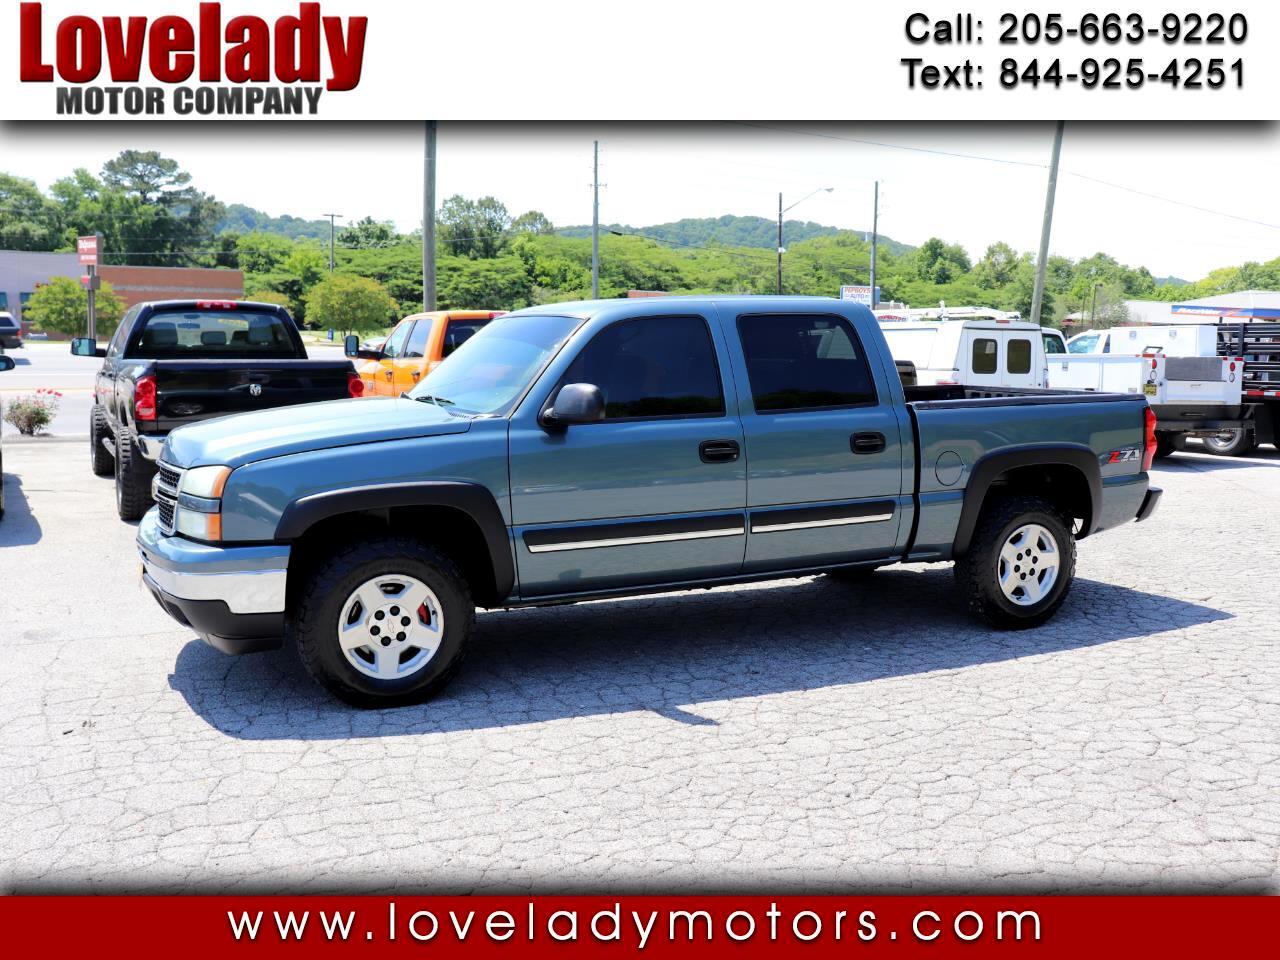 "Chevrolet Silverado 1500 Crew Cab 143.5"" WB 4WD LT2 2006"